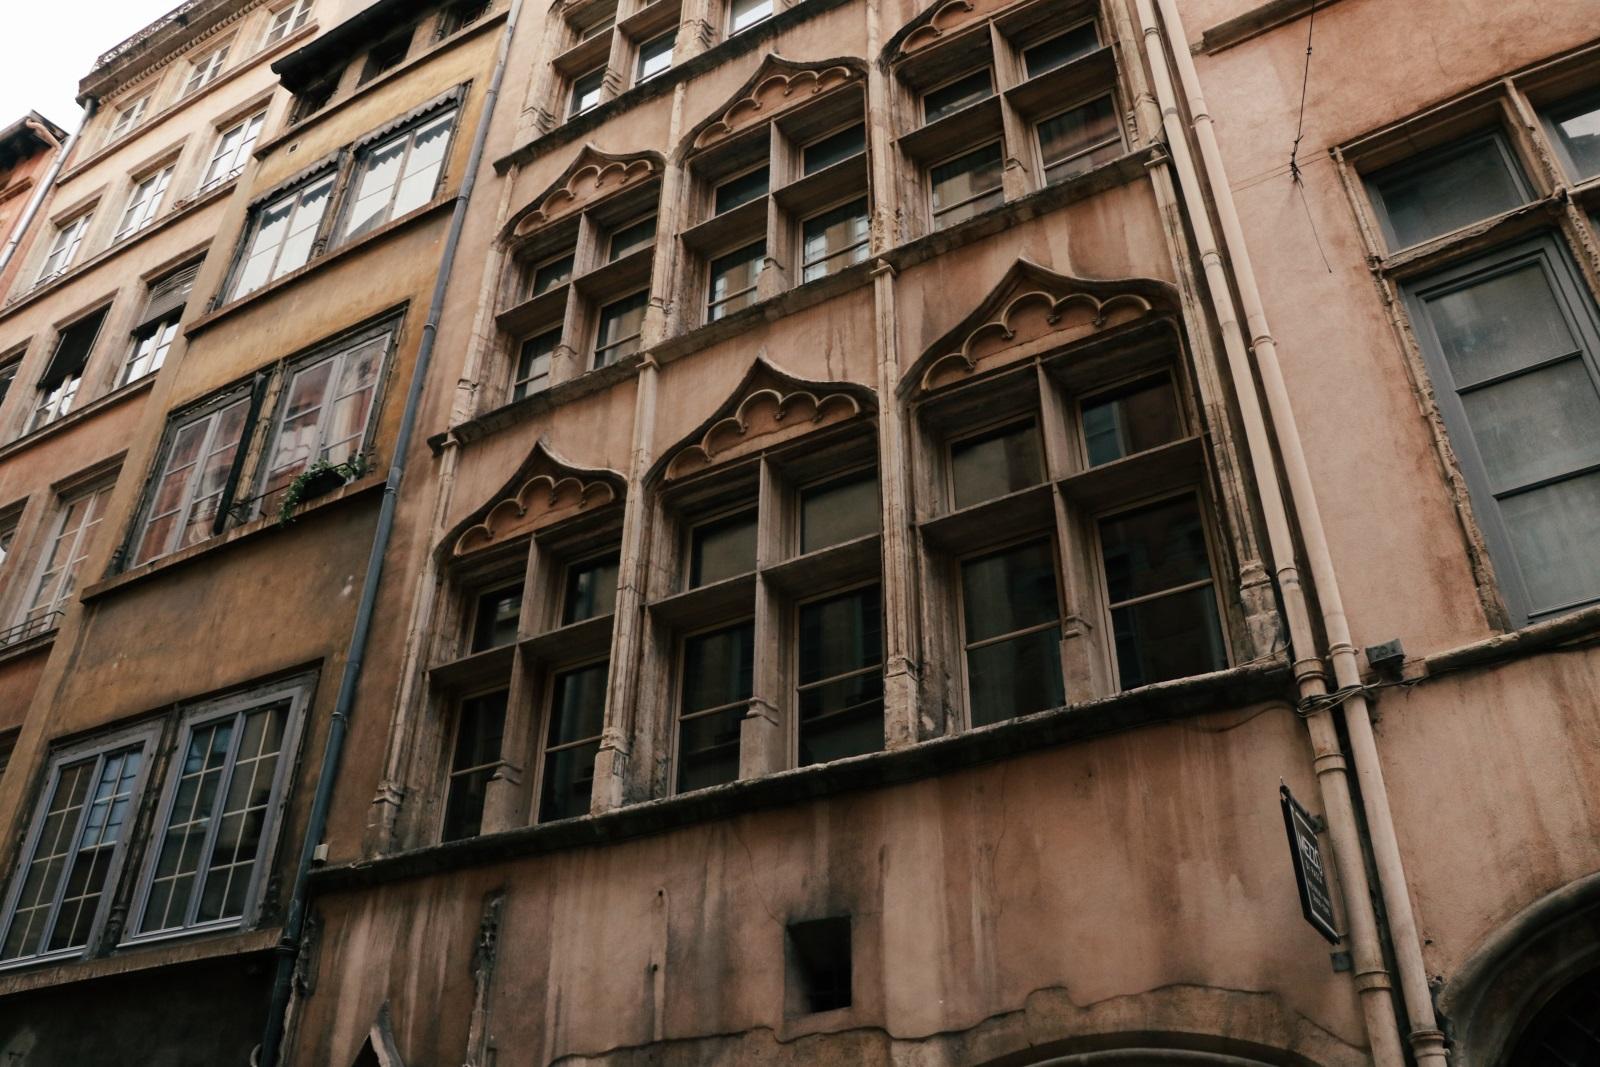 Vieux Lyon виды